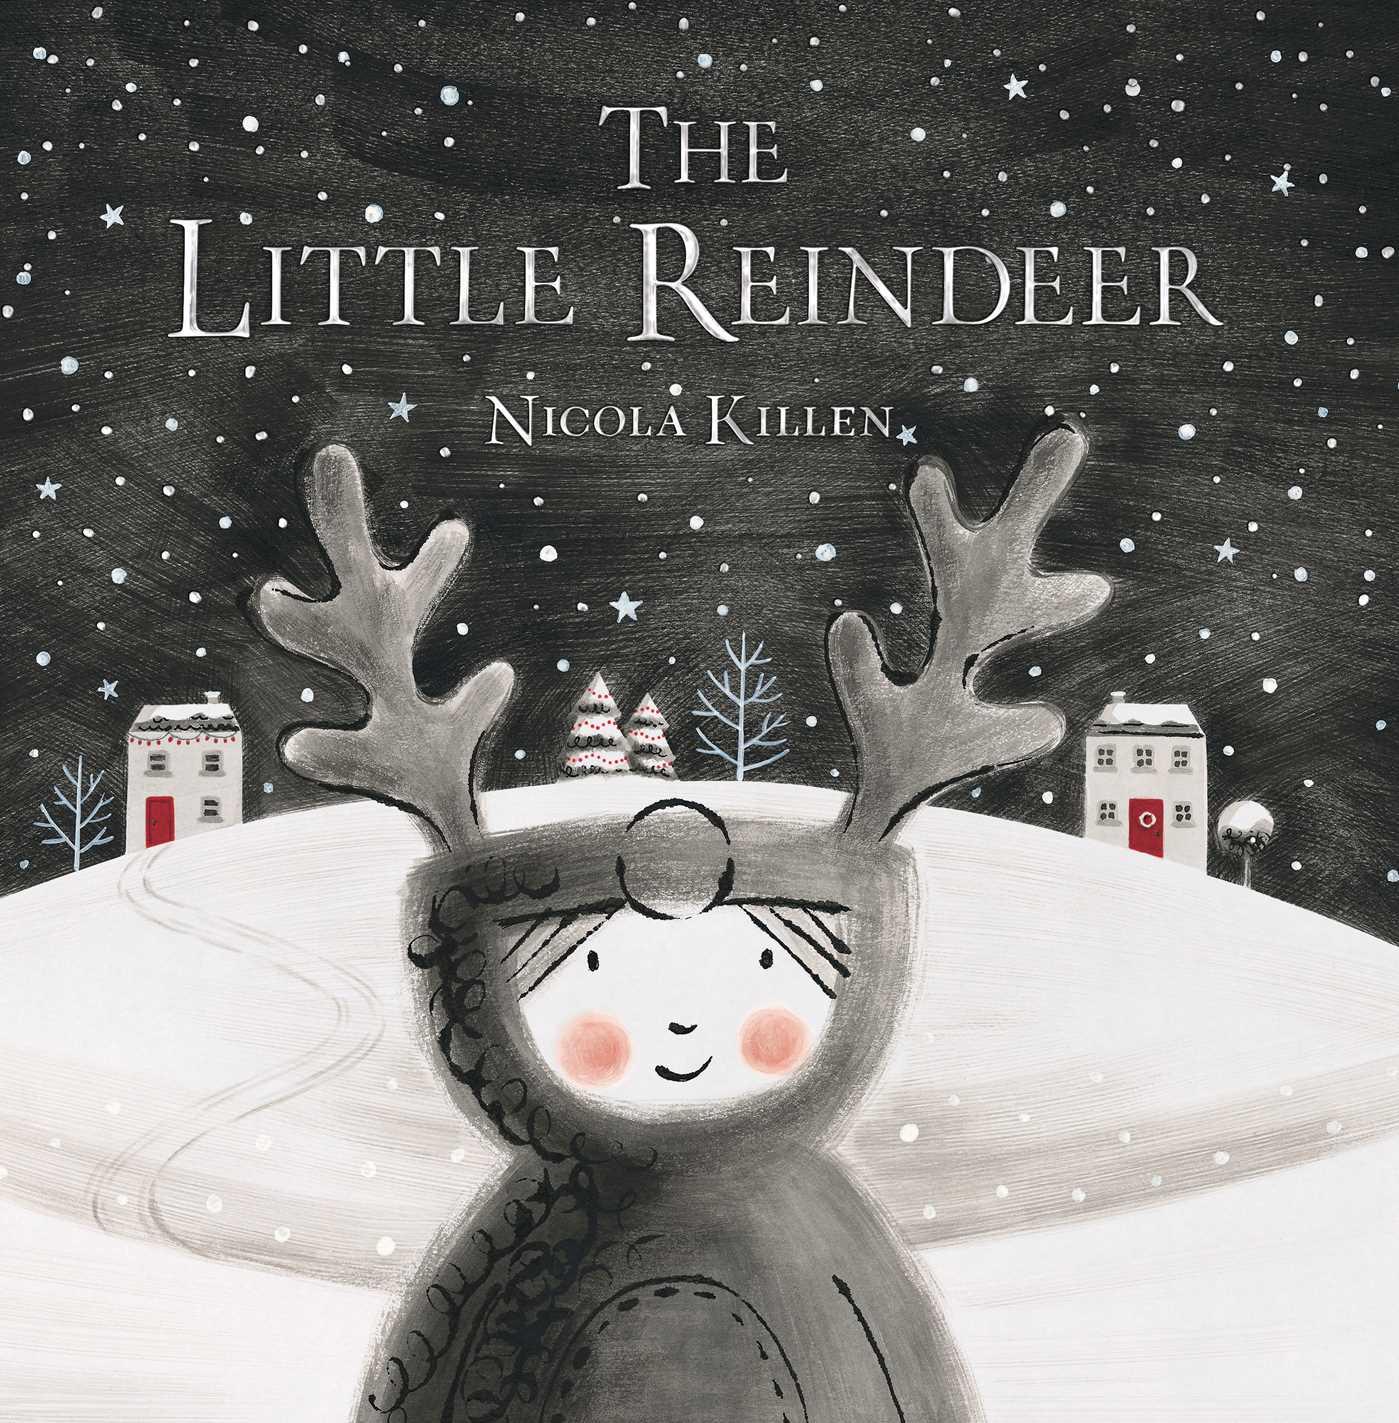 The little reindeer 9781481486866 hr